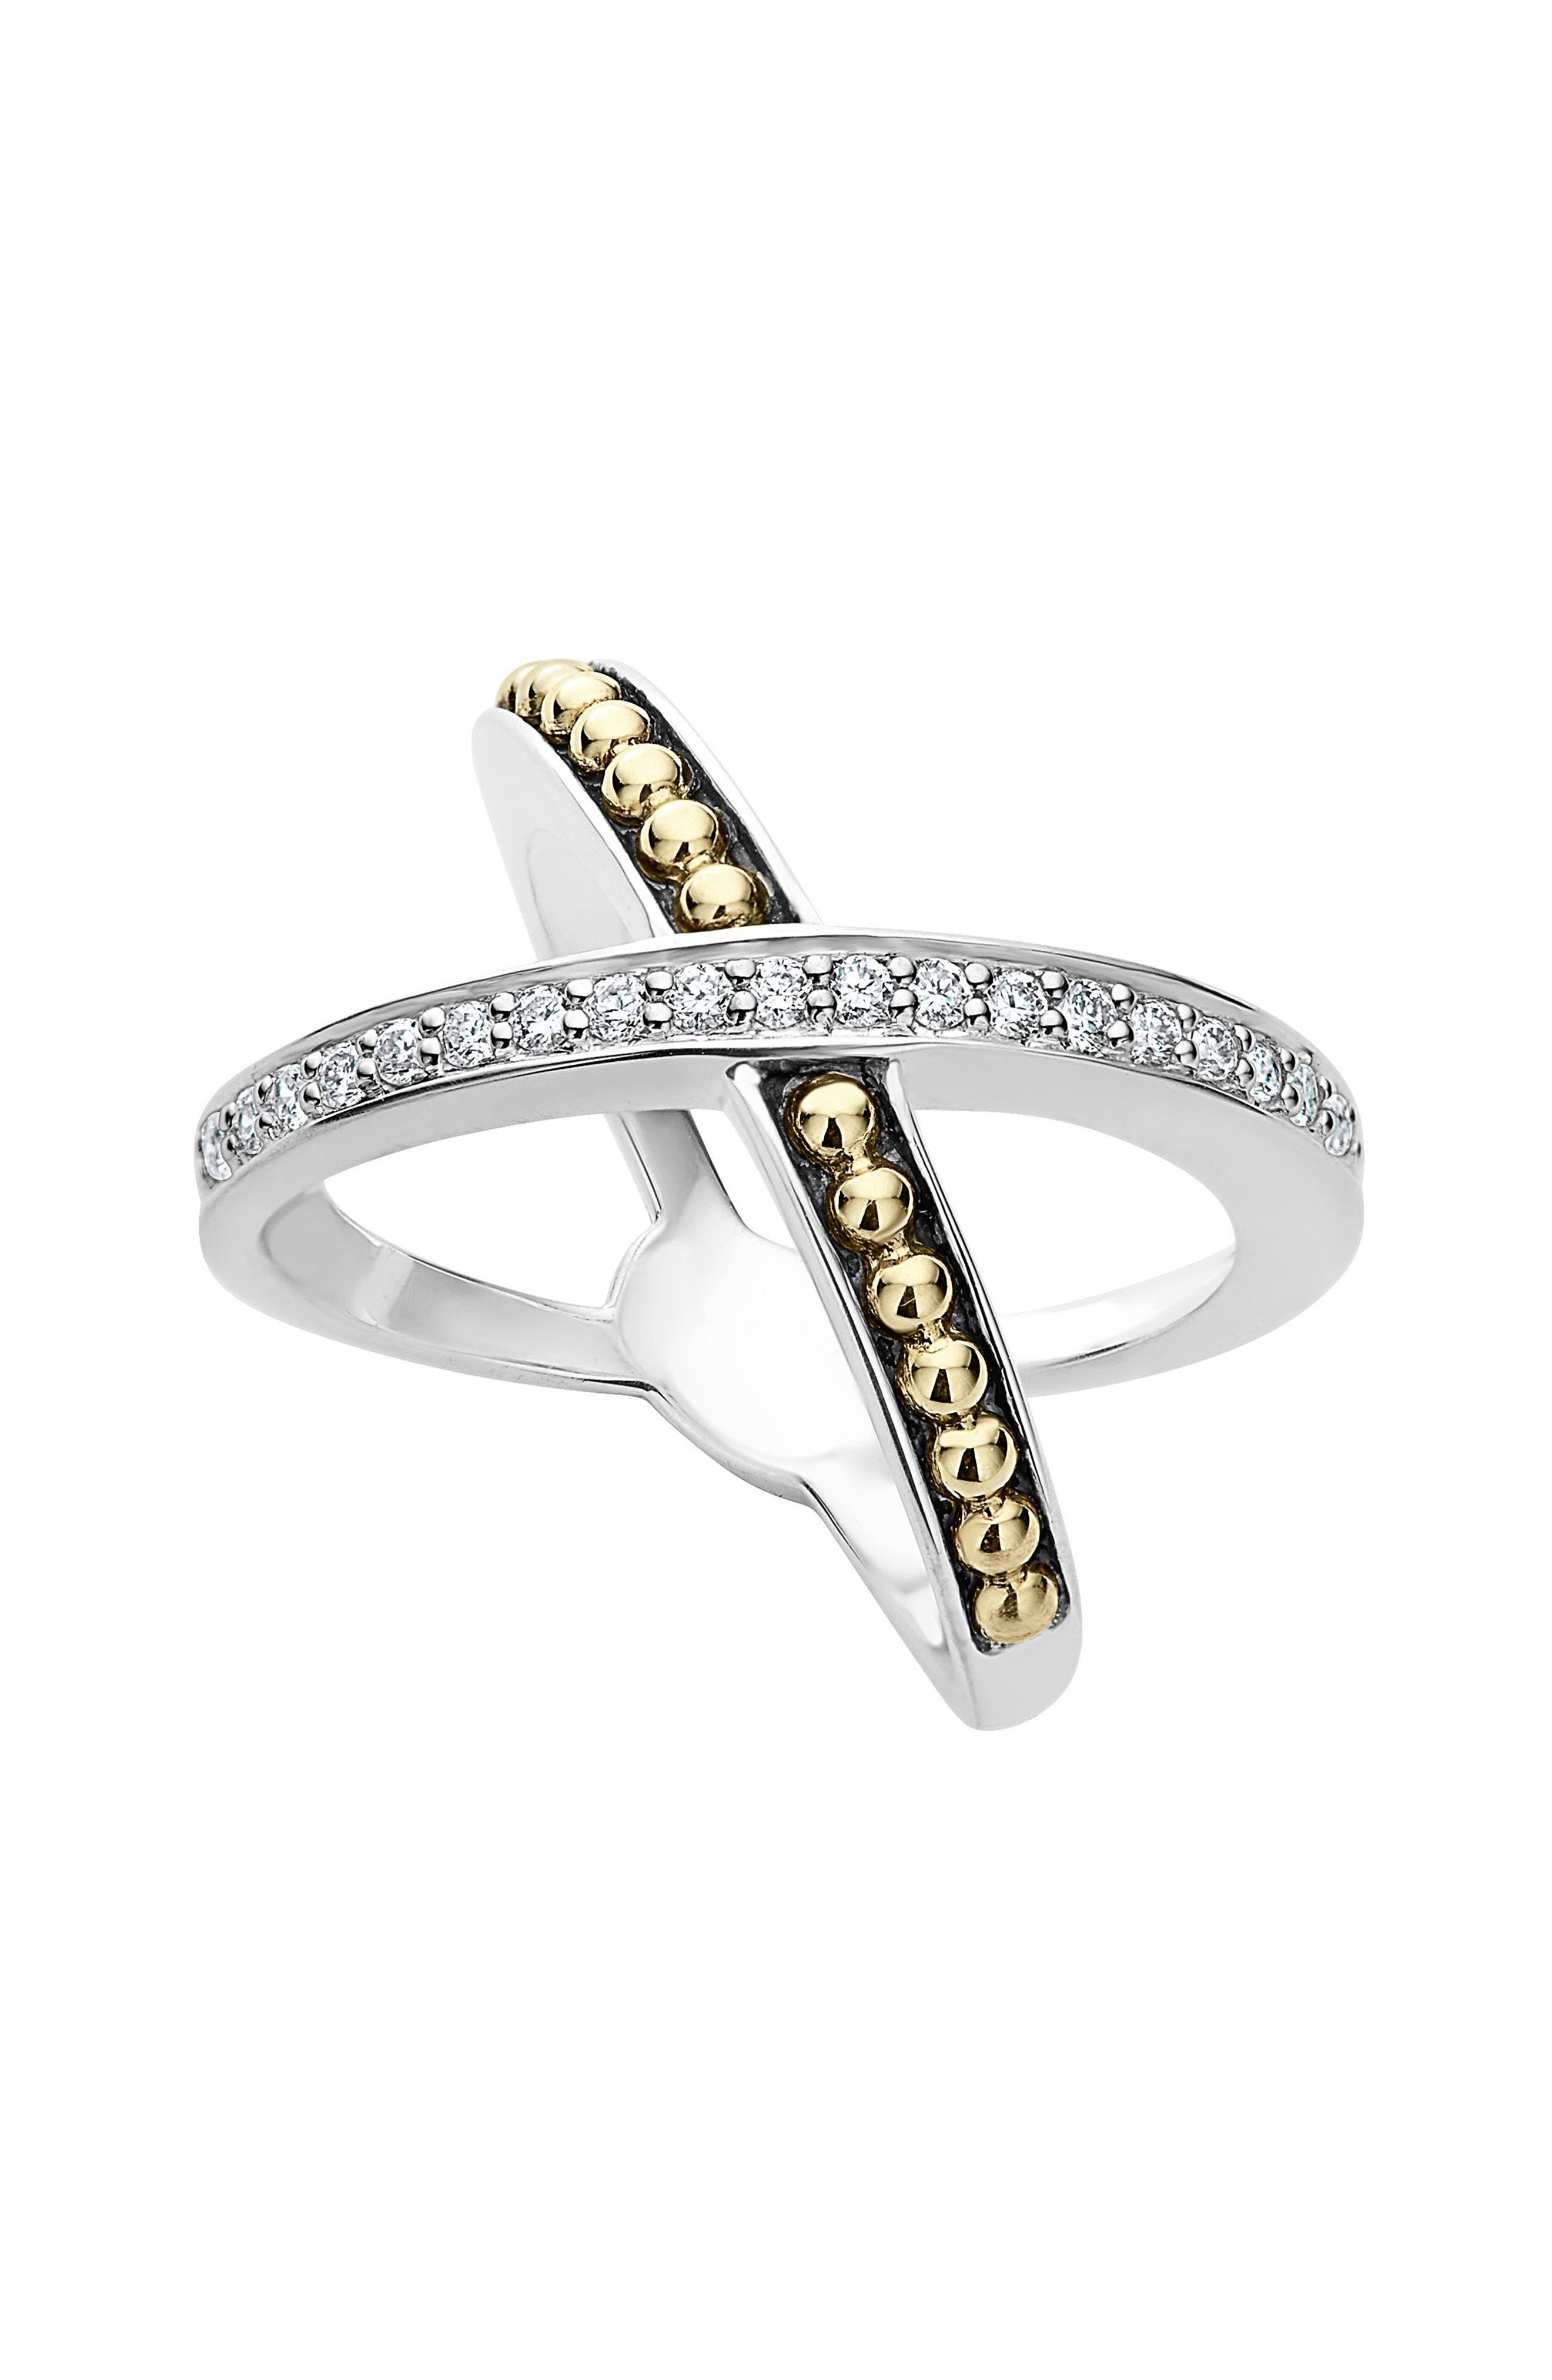 KSL Diamond Pavé Crossover Ring,                         Main,                         color, SILVER/ GOLD/ DIAMOND